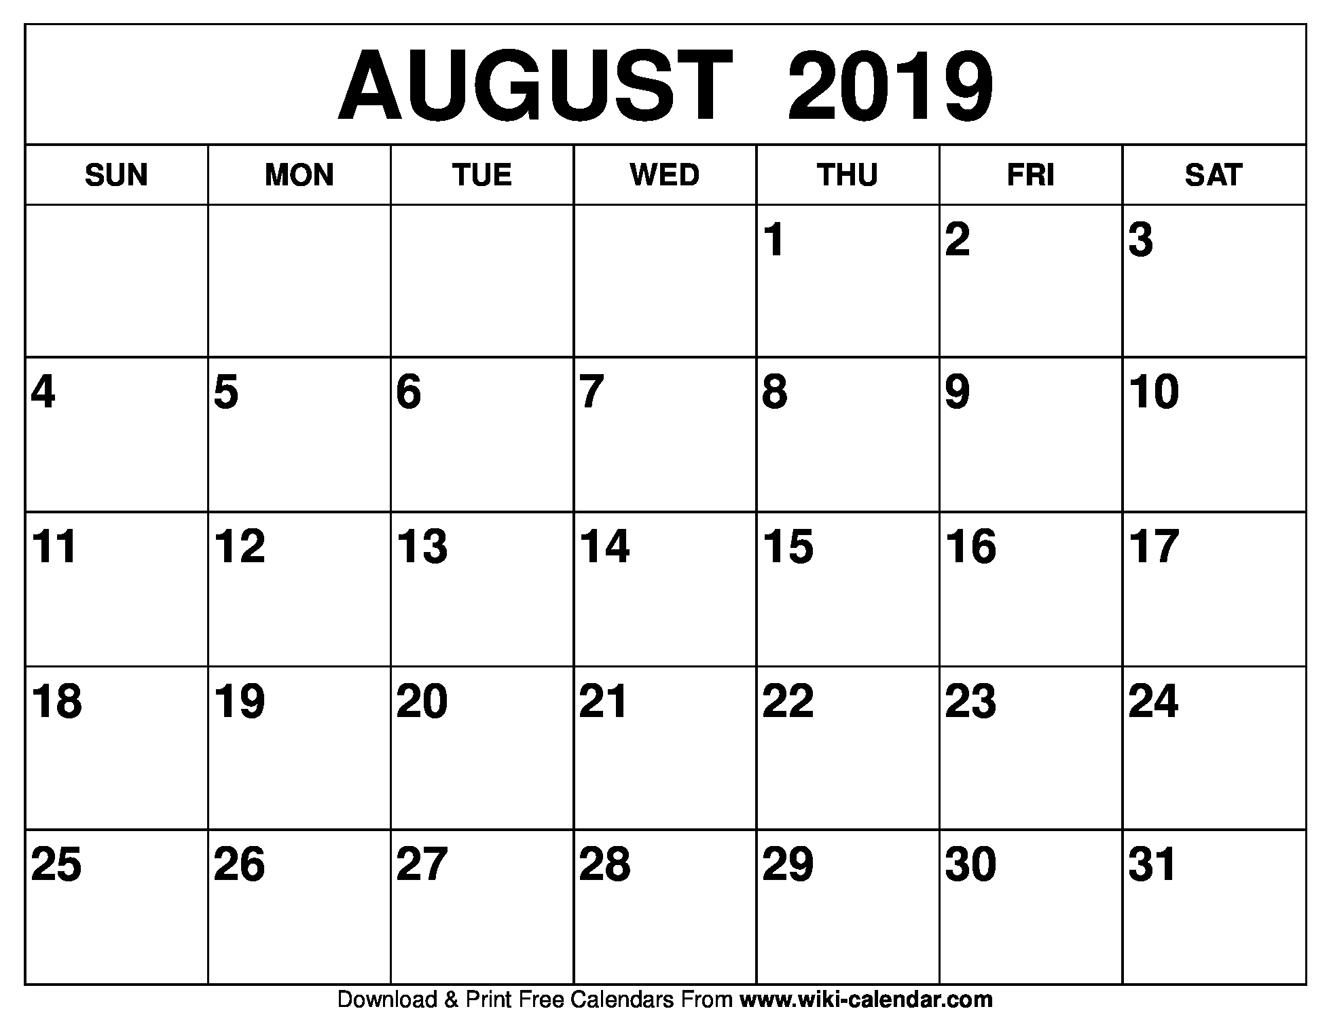 Blank August 2019 Calendar Printable within Blank August Colorful Calendar